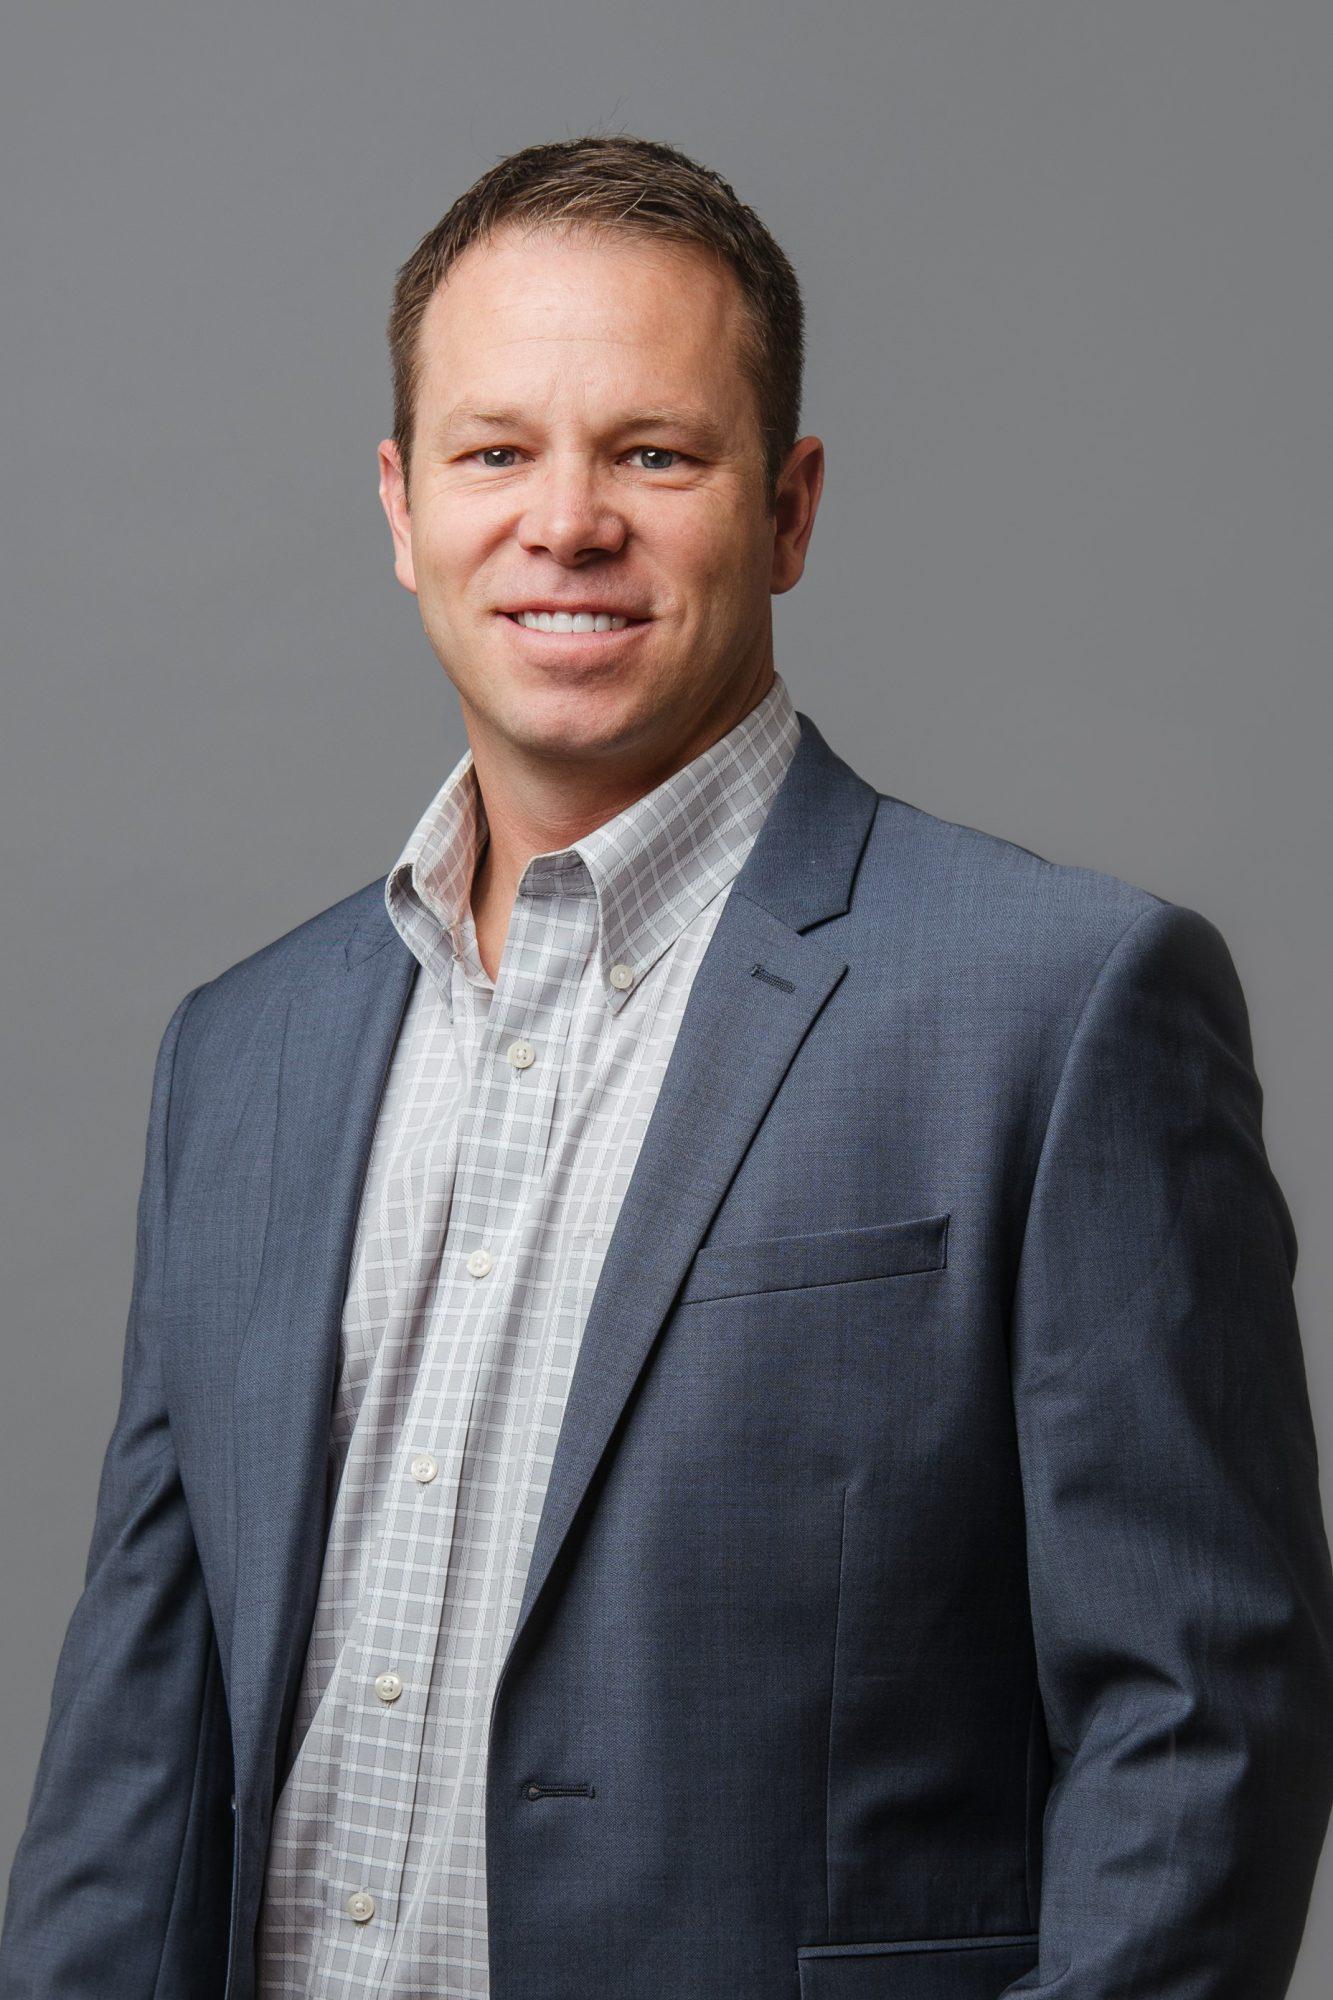 Photo of Joshua Snyder, MD